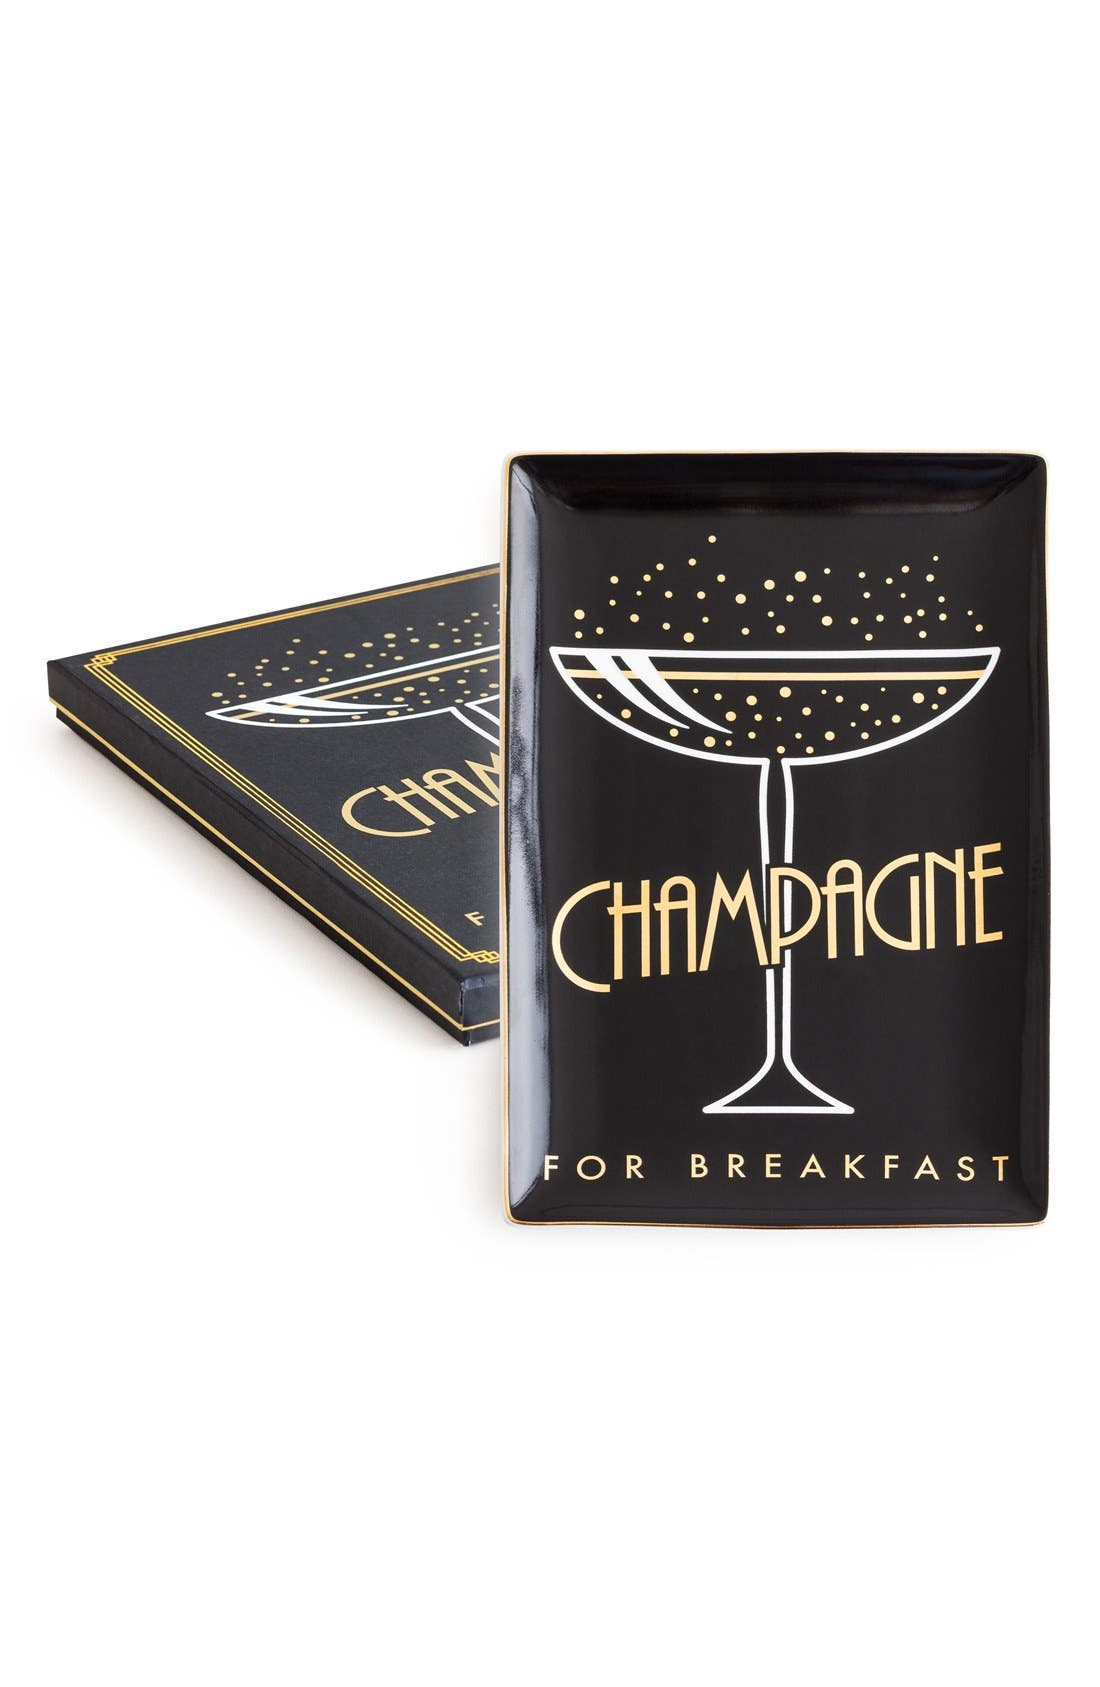 Alternate Image 1 Selected - Rosanna Champagne for Breakfast Porcelain Trinket Tray